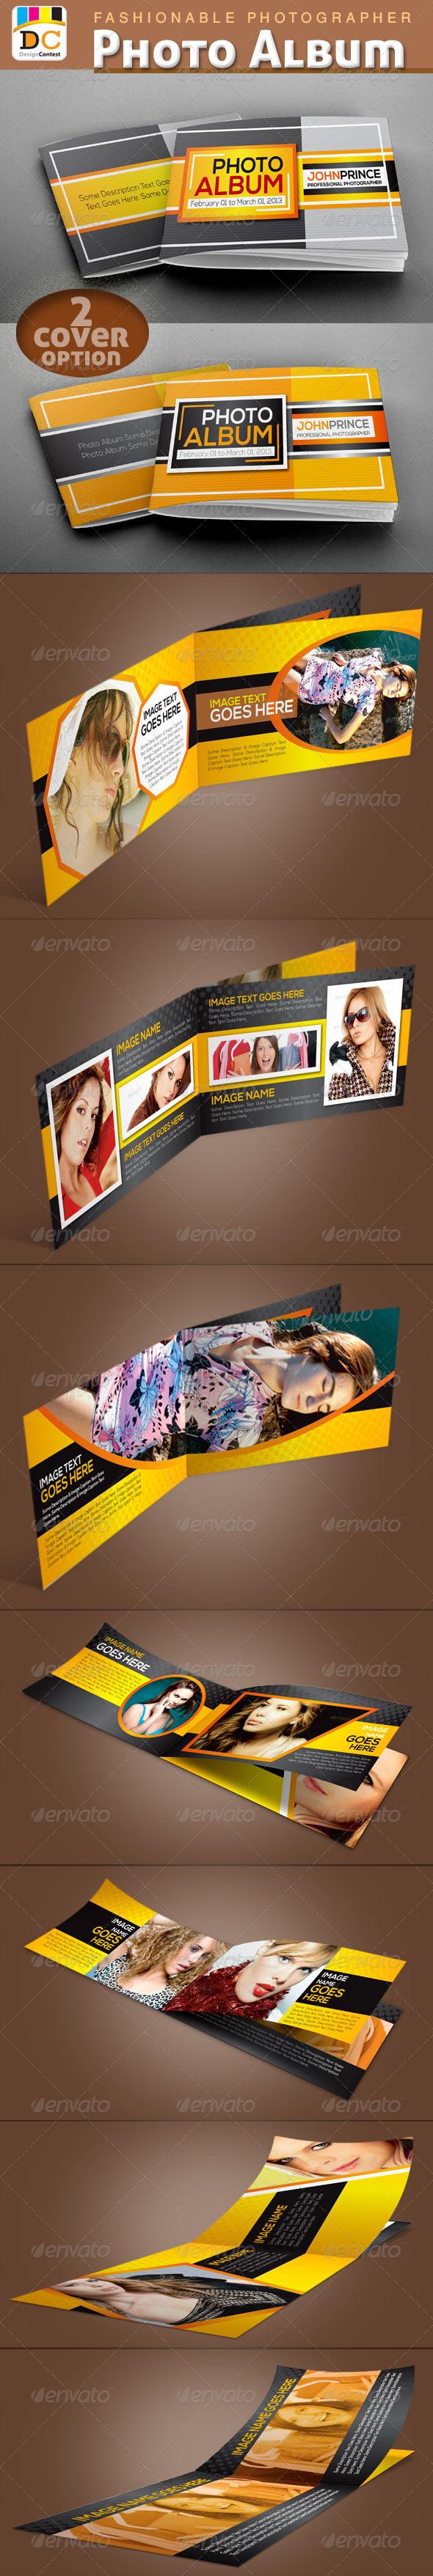 Fashionable Photographer Photo Album  - Photo Albums Print Templates